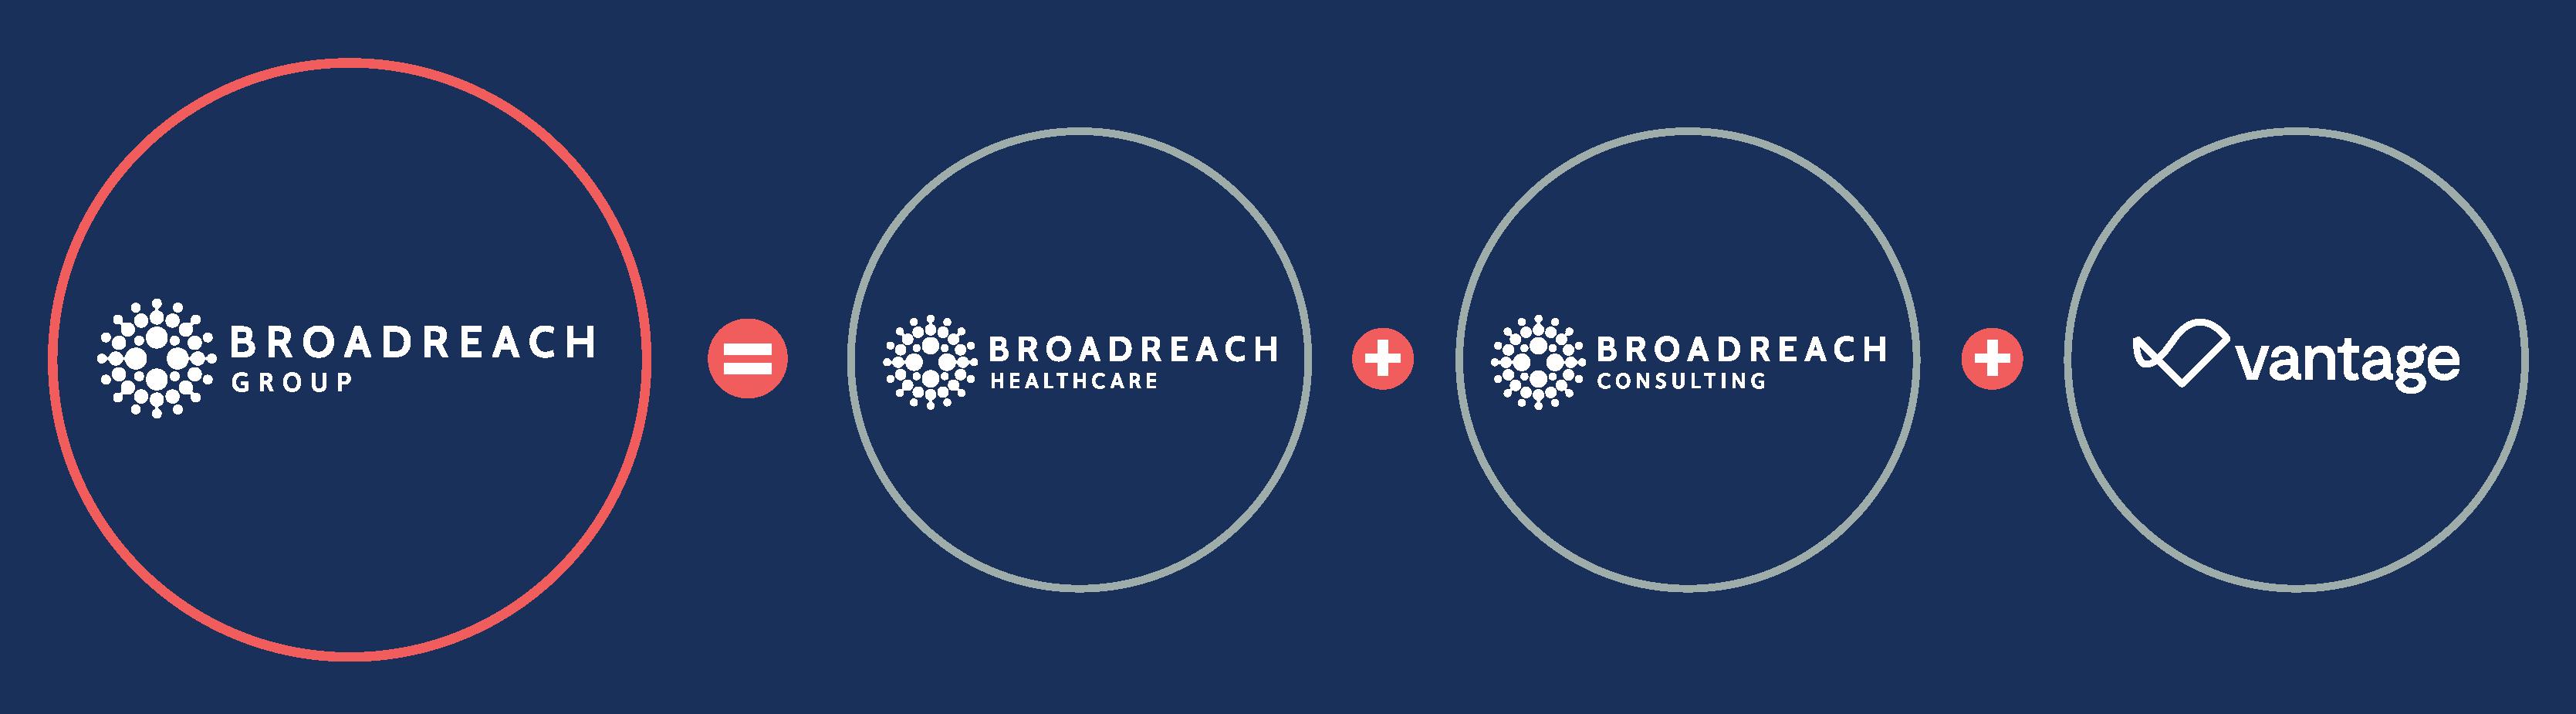 https://www.broadreachcorporation.com/wp-content/uploads/2020/02/BroadReachMakeup_1204x677_d4.pdf.png